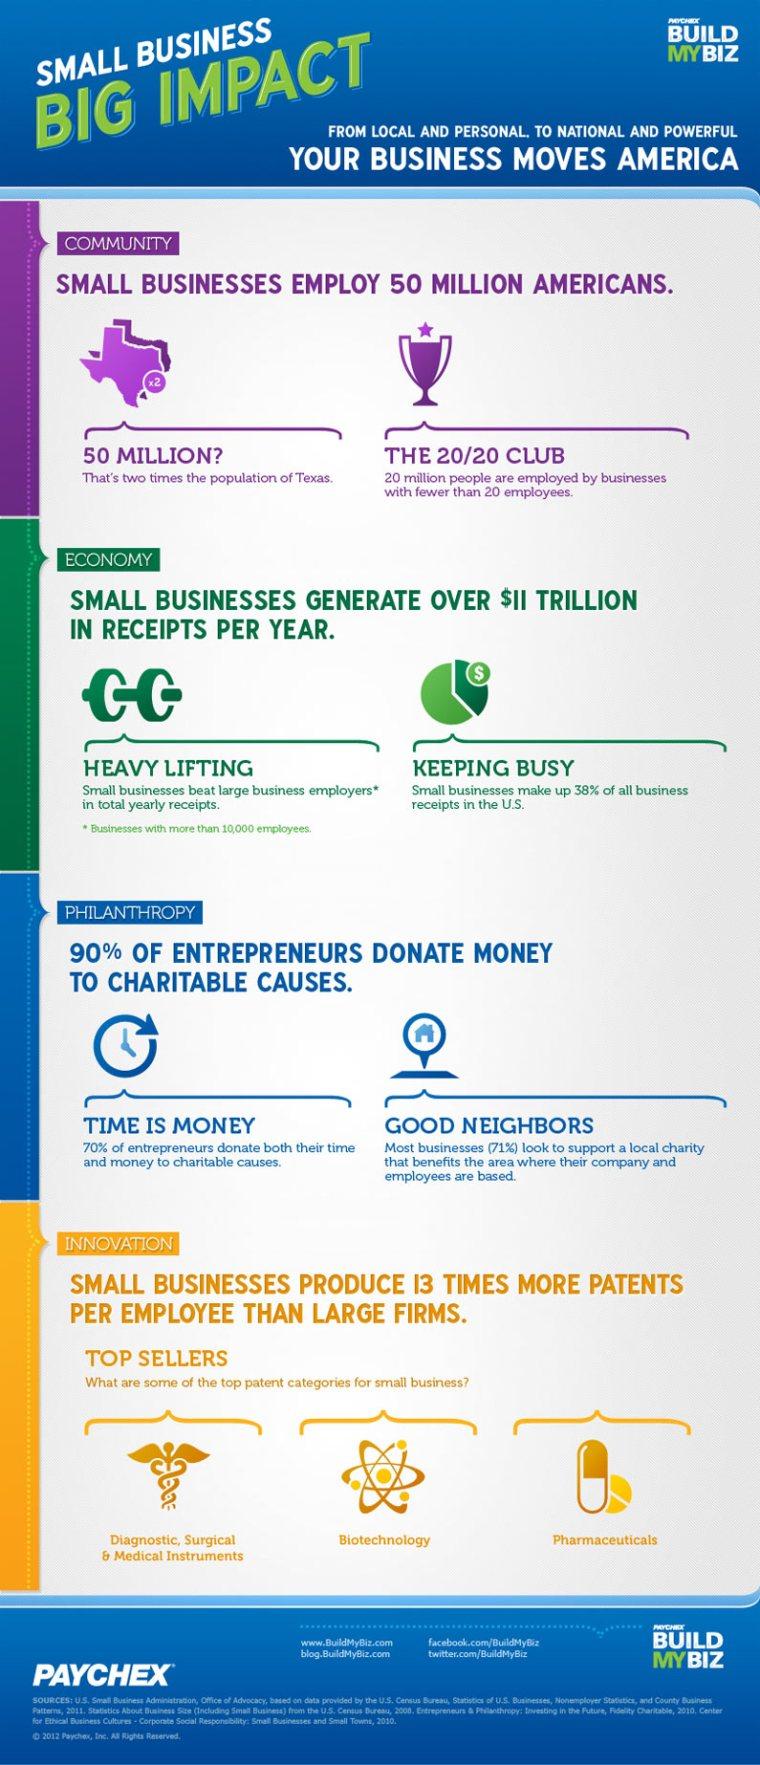 Small Buisness Big Impact infographic